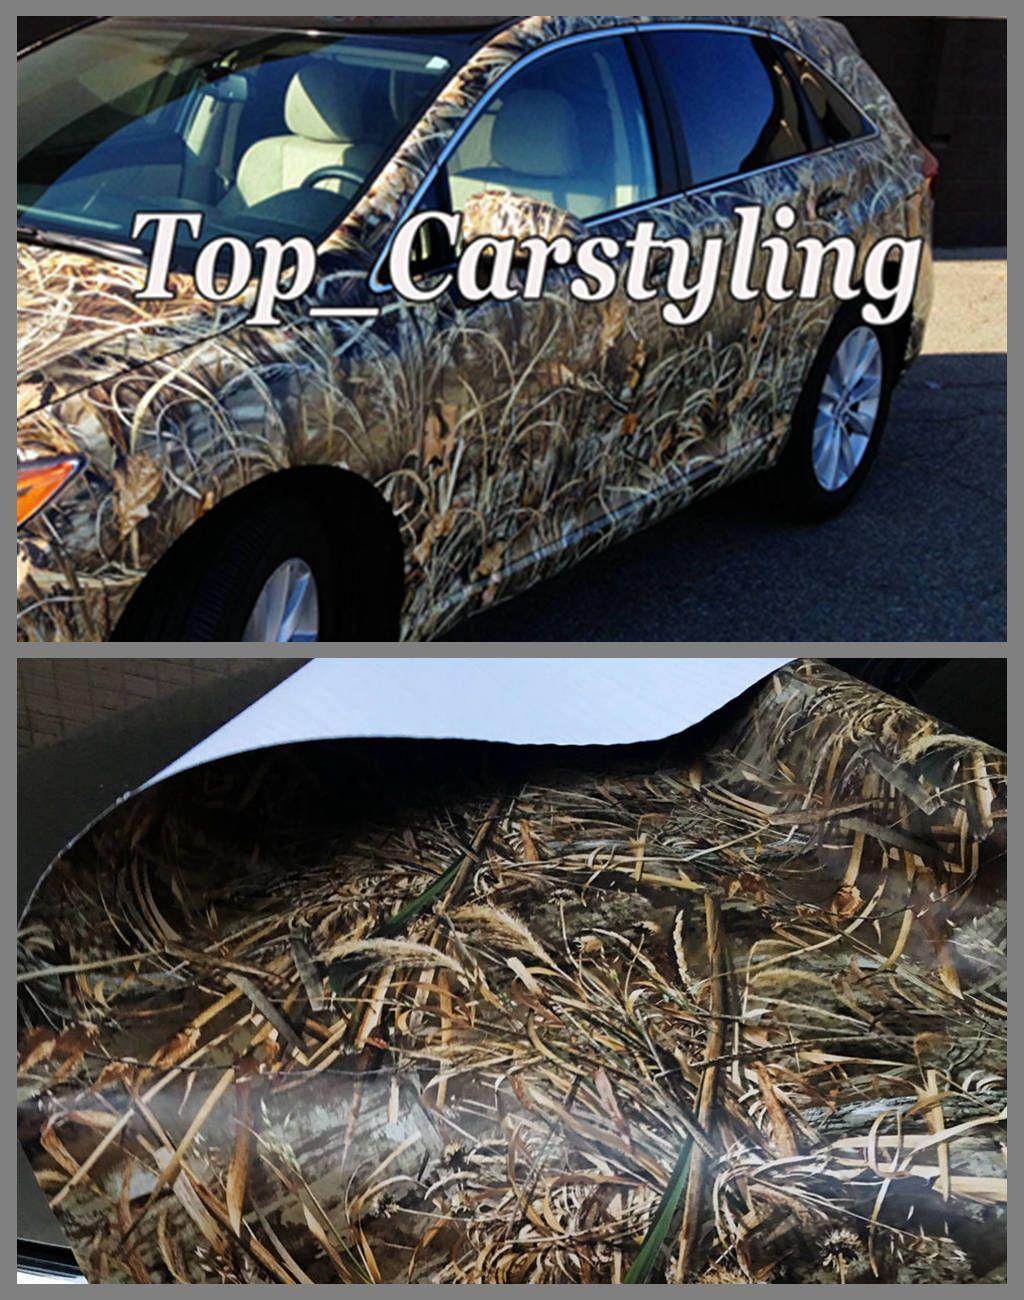 2018 realtree camo vinyl wrap grass leaf camouflage mossy oak car wrap film foil for vehicle. Black Bedroom Furniture Sets. Home Design Ideas